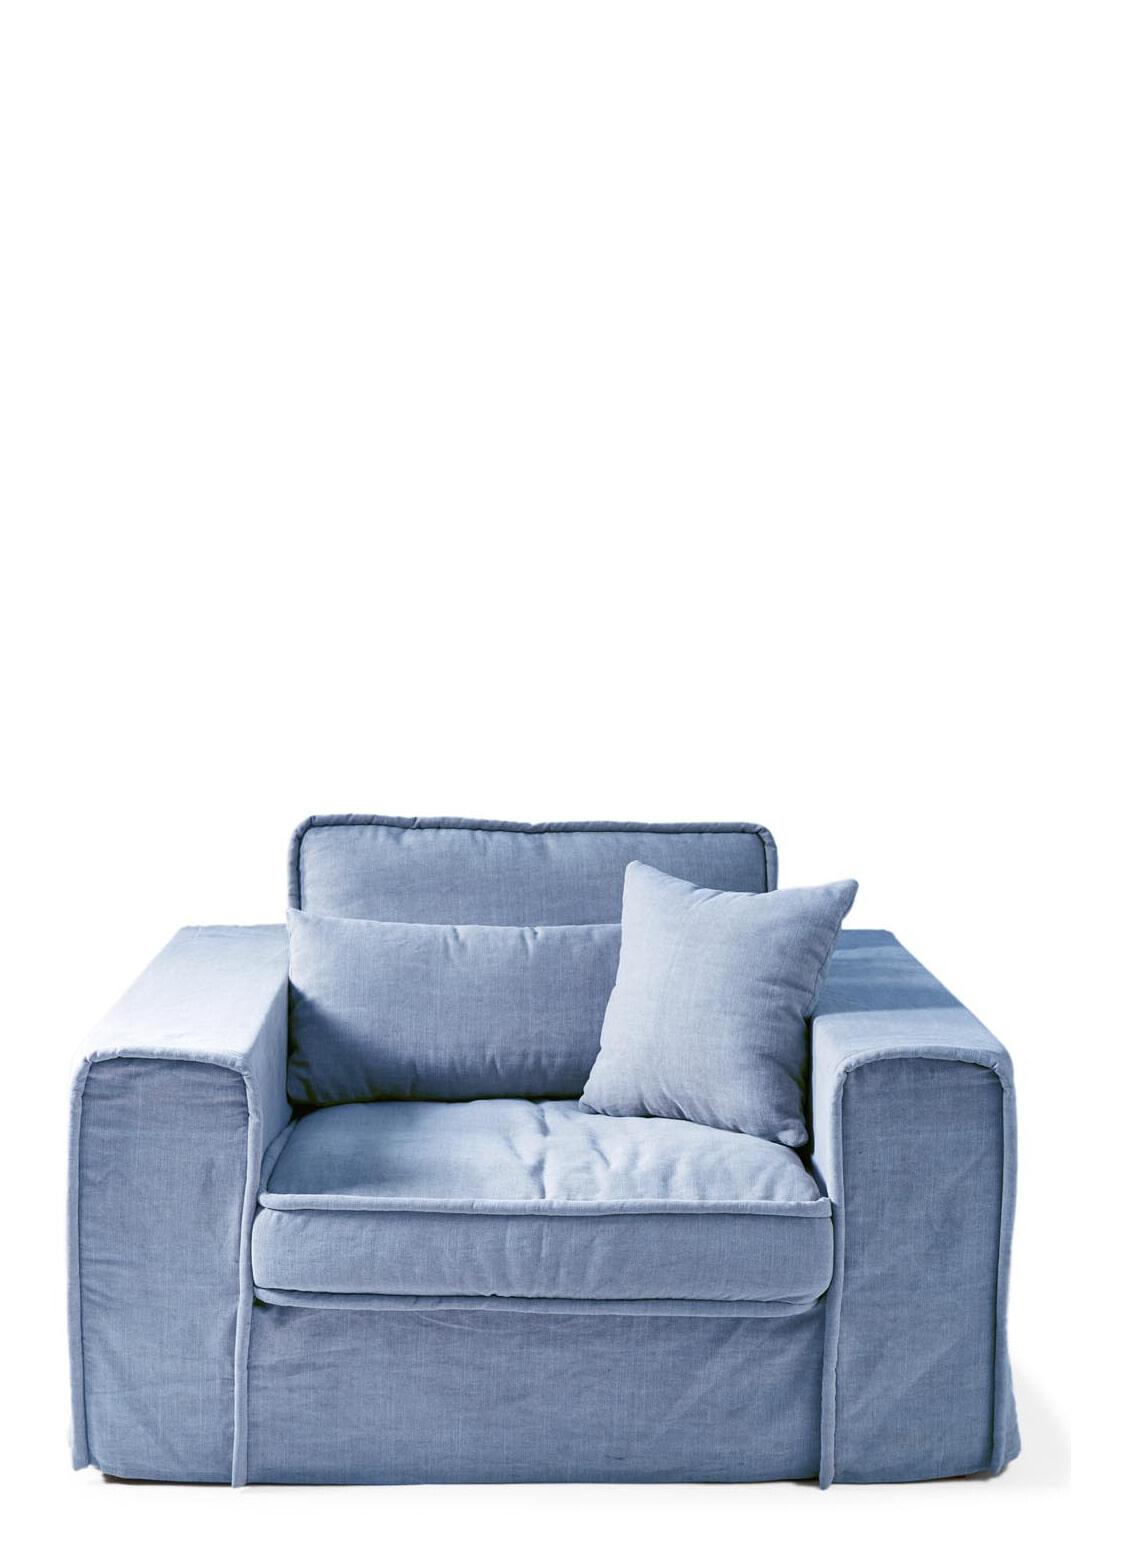 Riviera Maison Loveseat 'Metropolis' Cotton, kleur Ice Blue